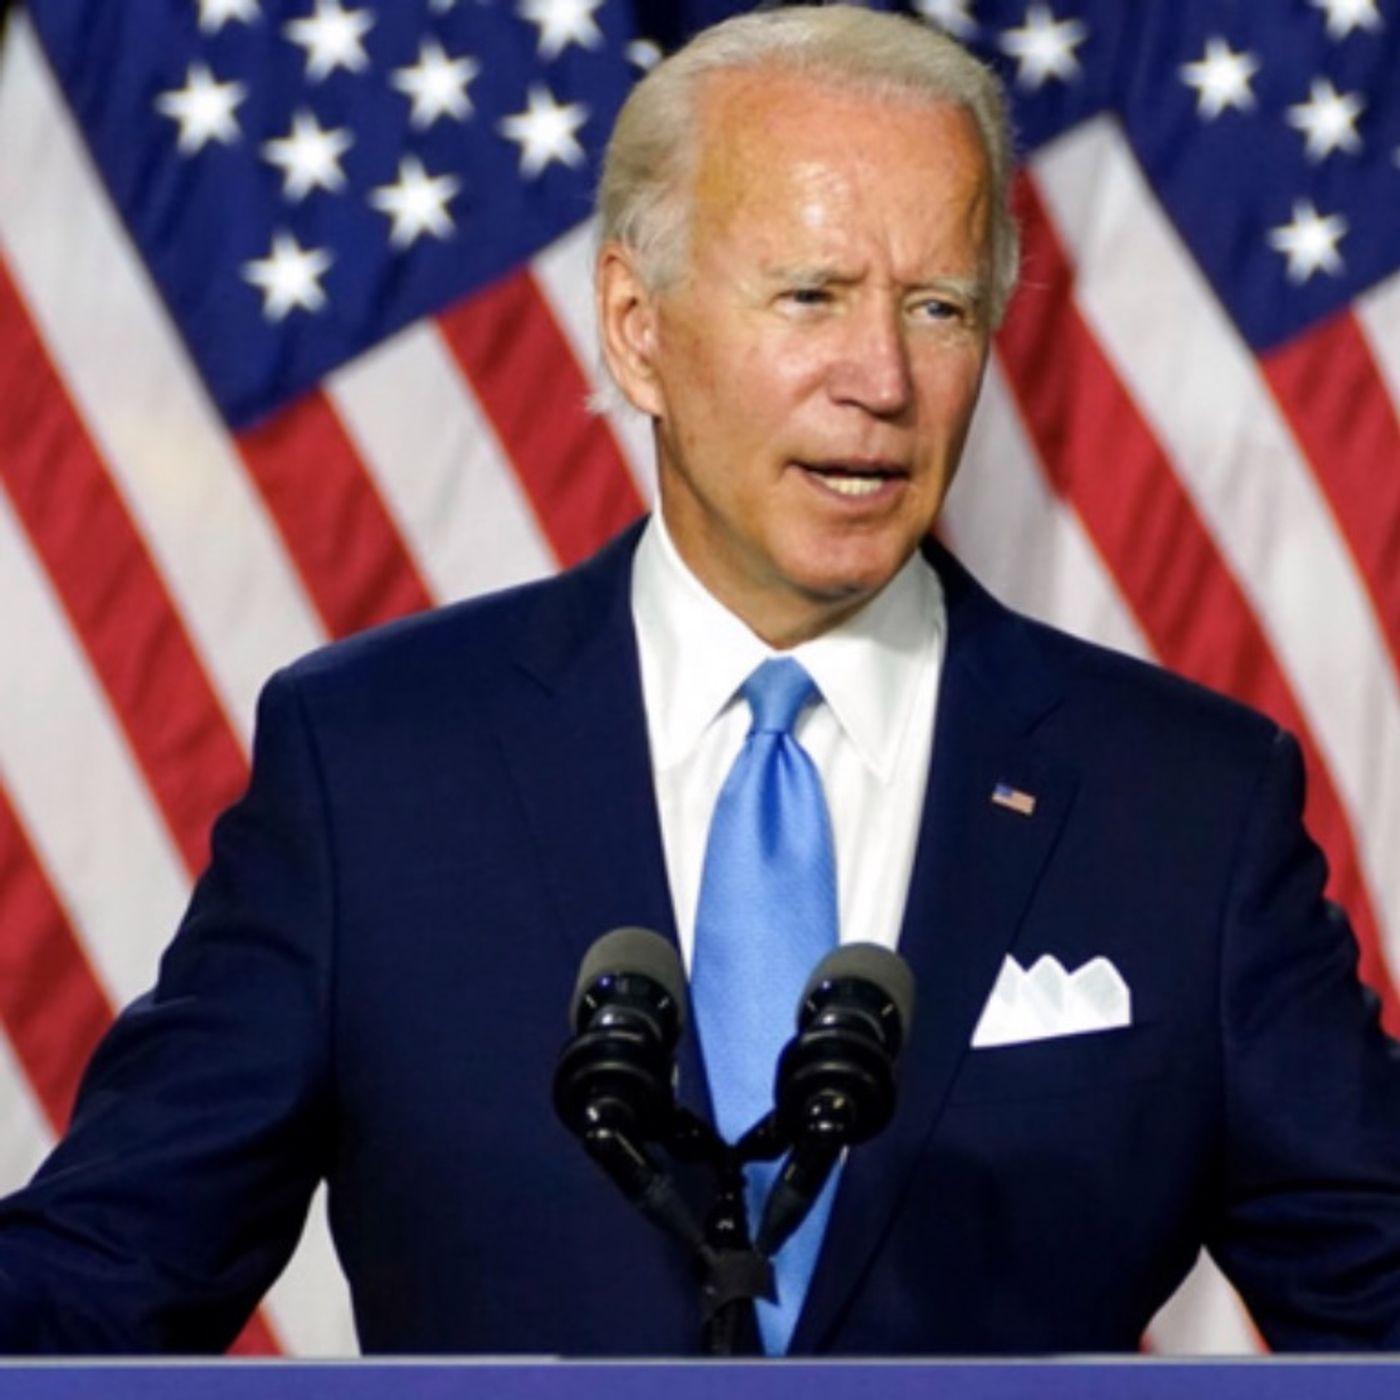 POLICY AND PRACTICE - Joe Biden's Domestic Agenda